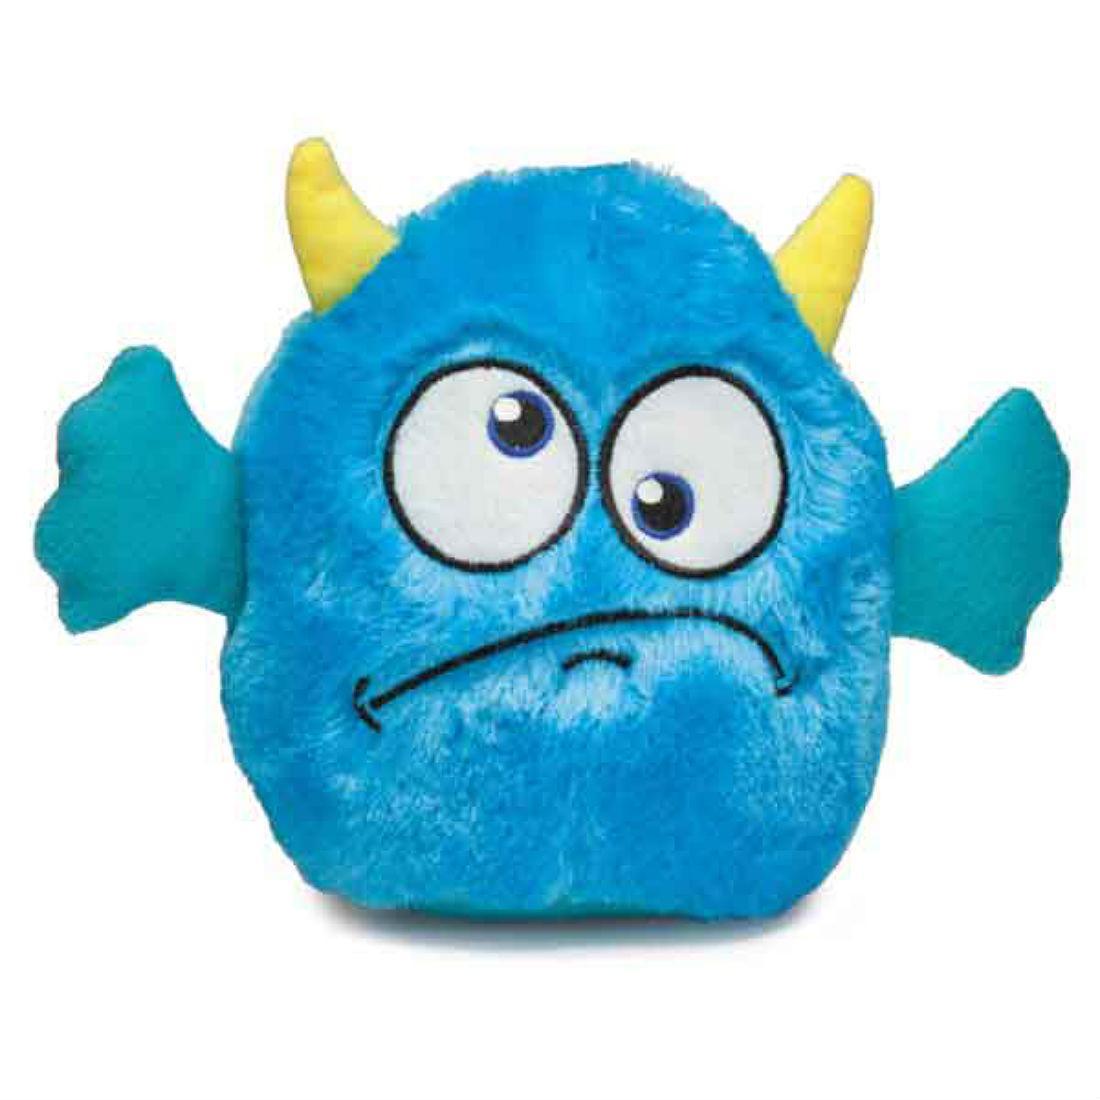 Zanies Rock Monster Plush Dog Toy - Blue